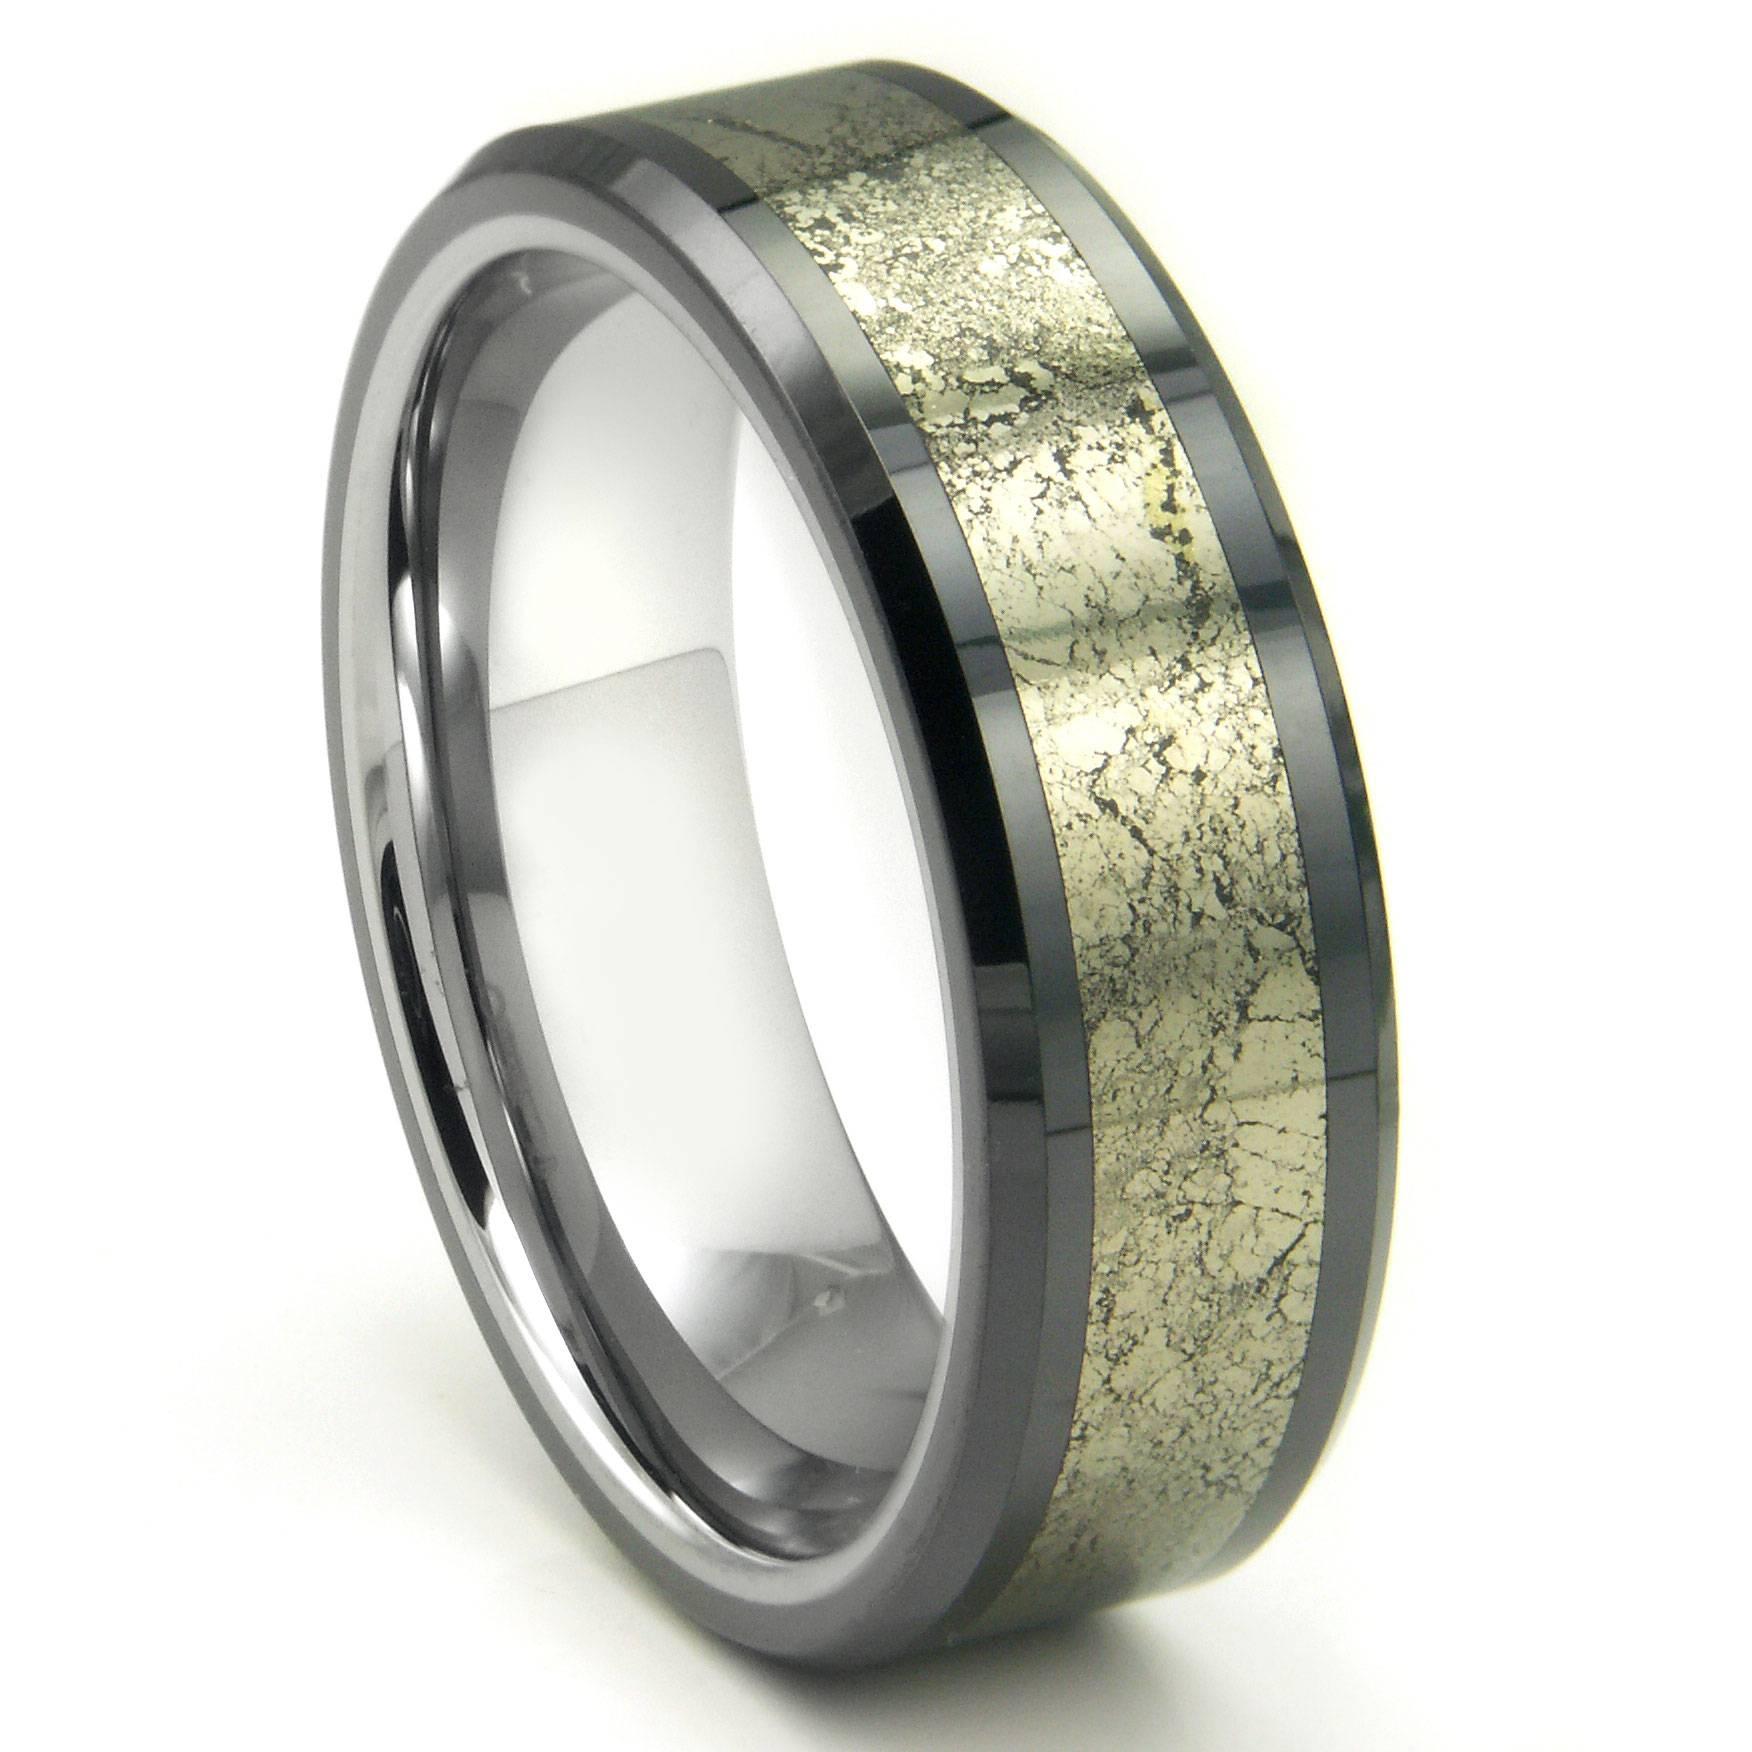 Tungsten Carbide Golden Meteorite Inlay Wedding Band Ring Regarding Gunmetal Wedding Bands (Gallery 2 of 15)